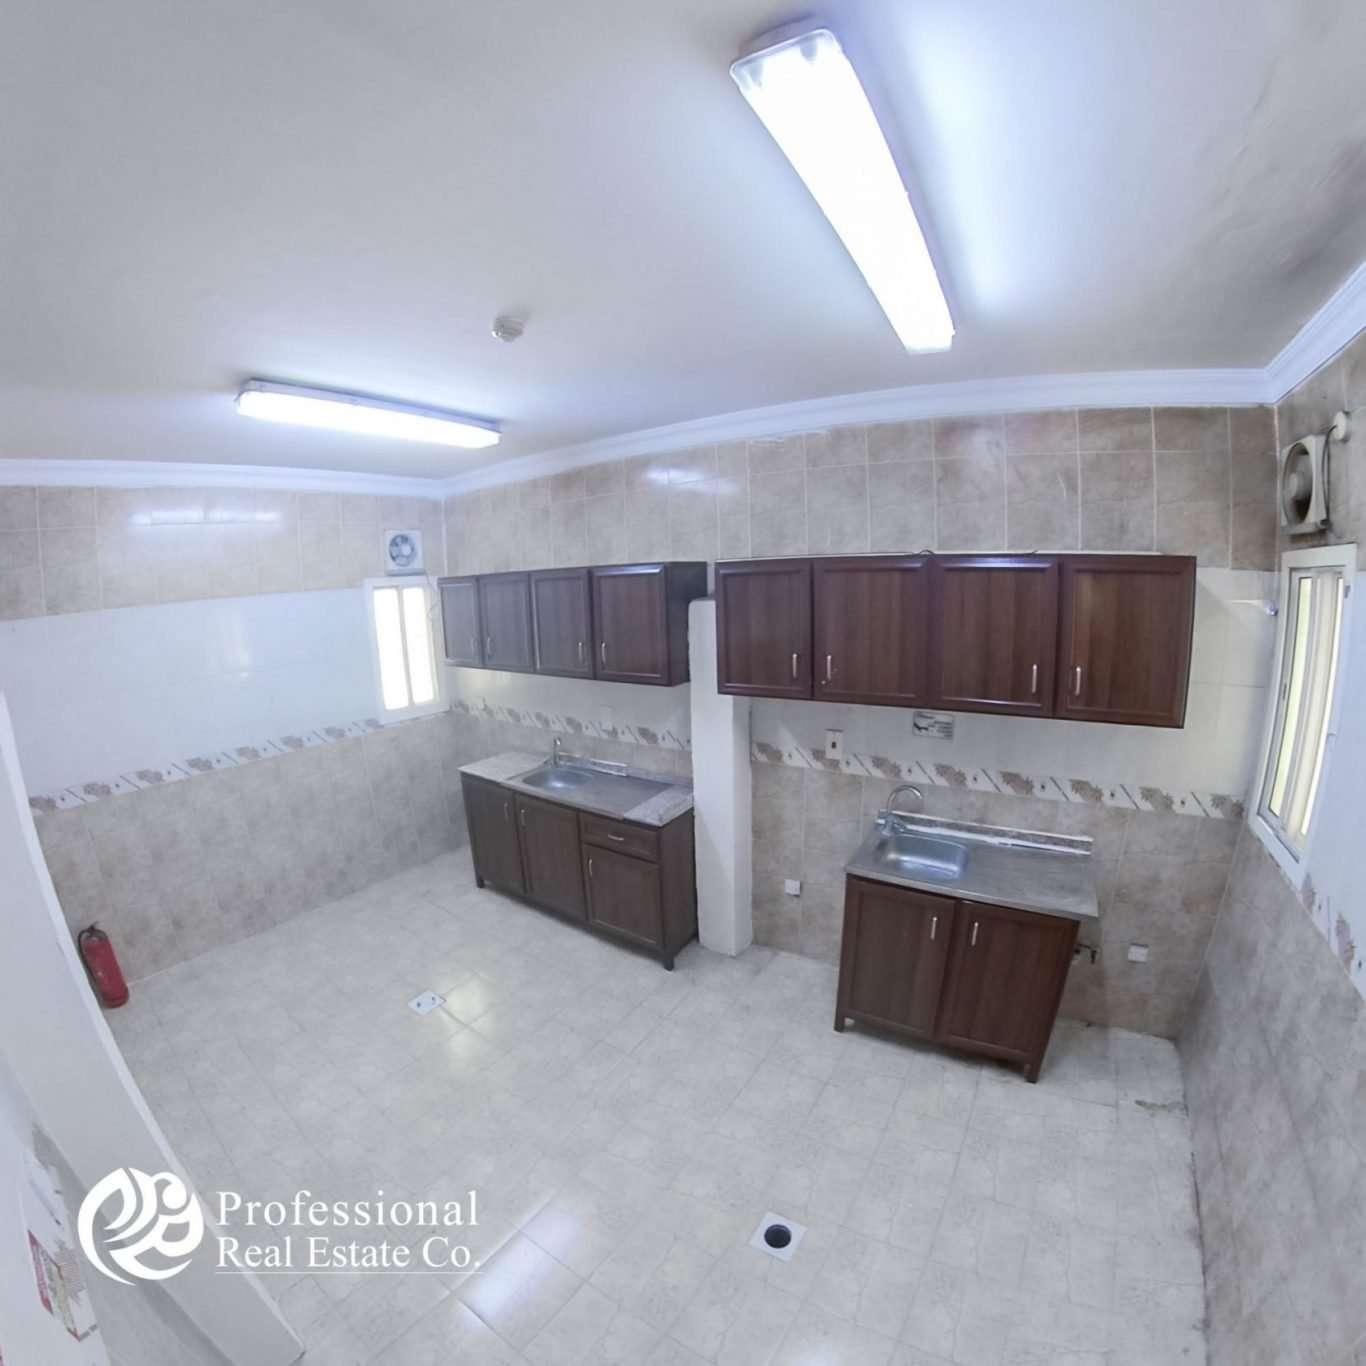 Unfurnished, 5 Bedroom Apartment in Umm Ghuwailina